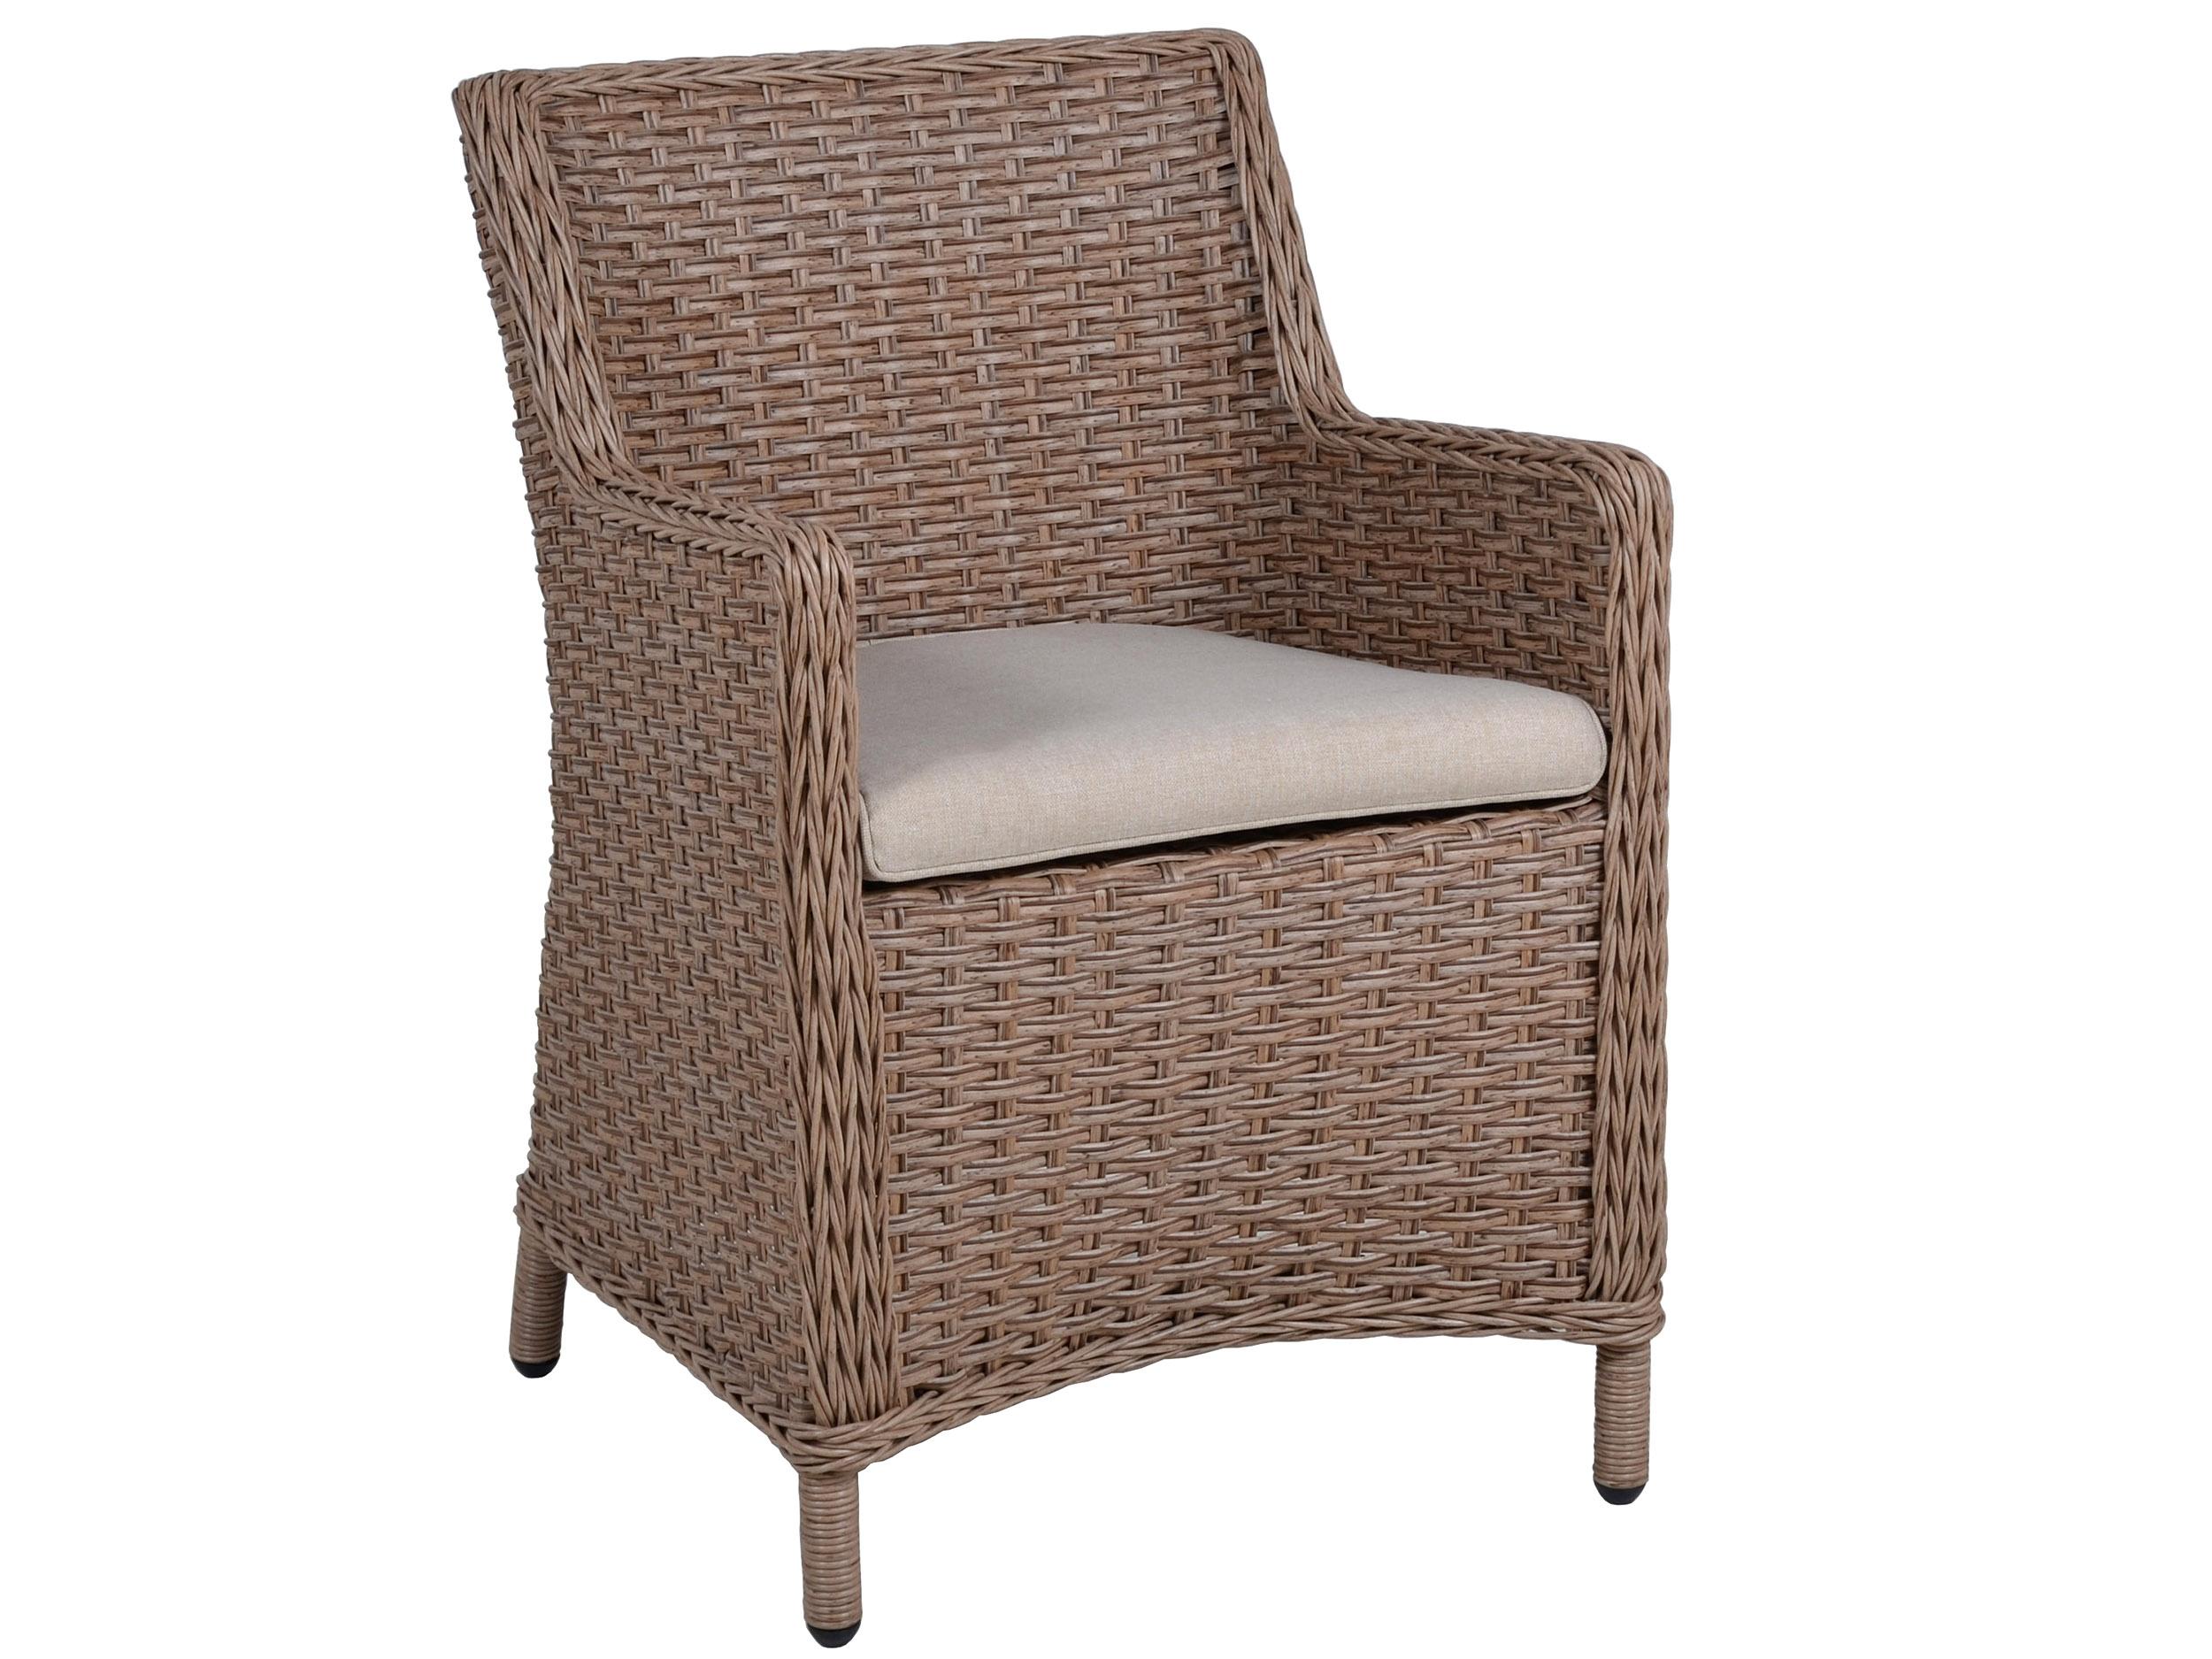 geflecht gartensessel lotus rattanoptik inkl sitzkissen gartenm bel l nse. Black Bedroom Furniture Sets. Home Design Ideas